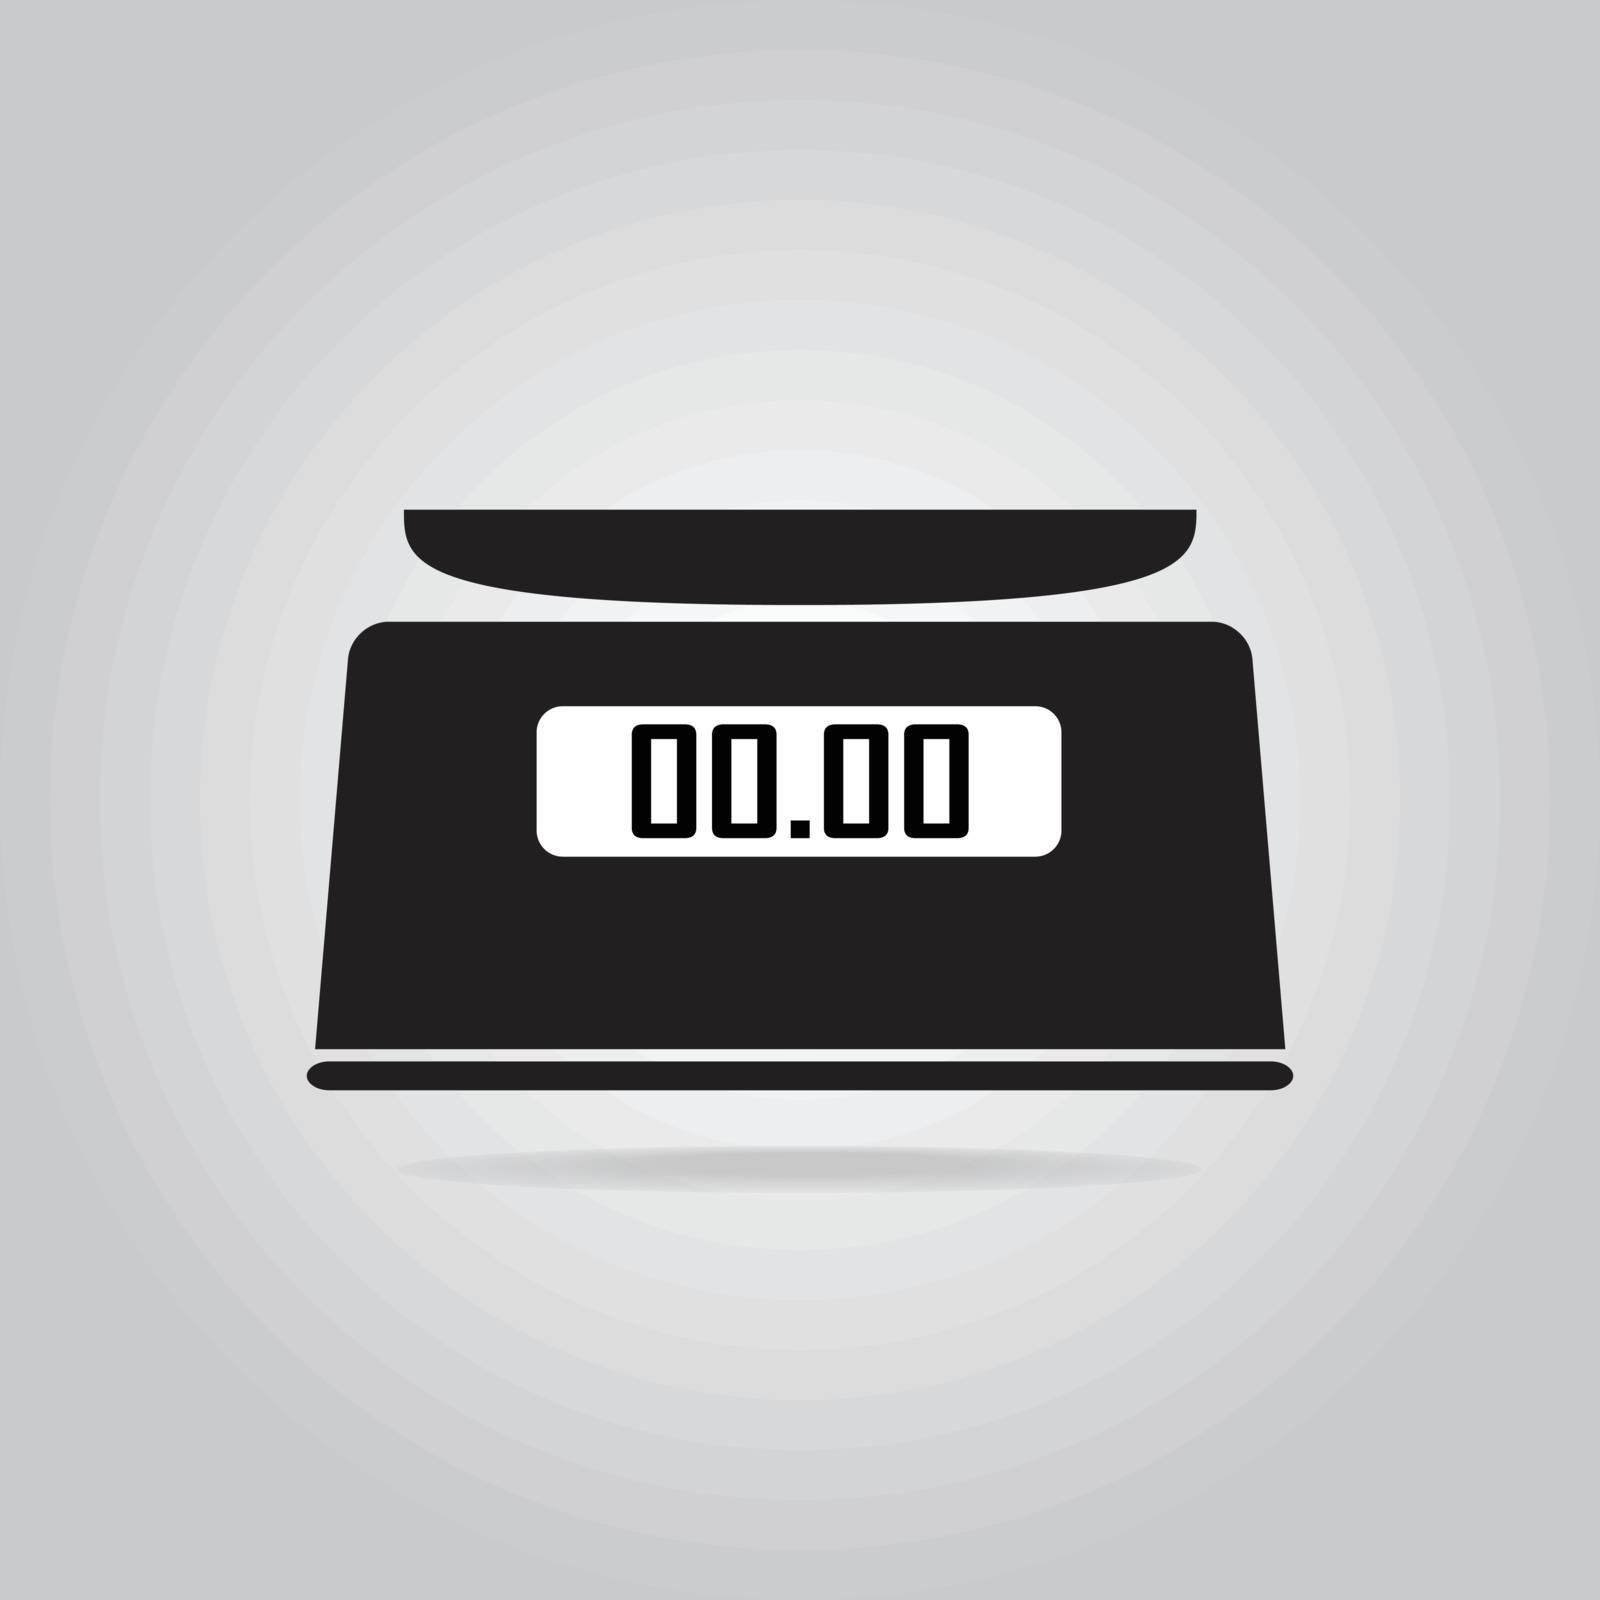 Digital scale icon, symbol vector illustration